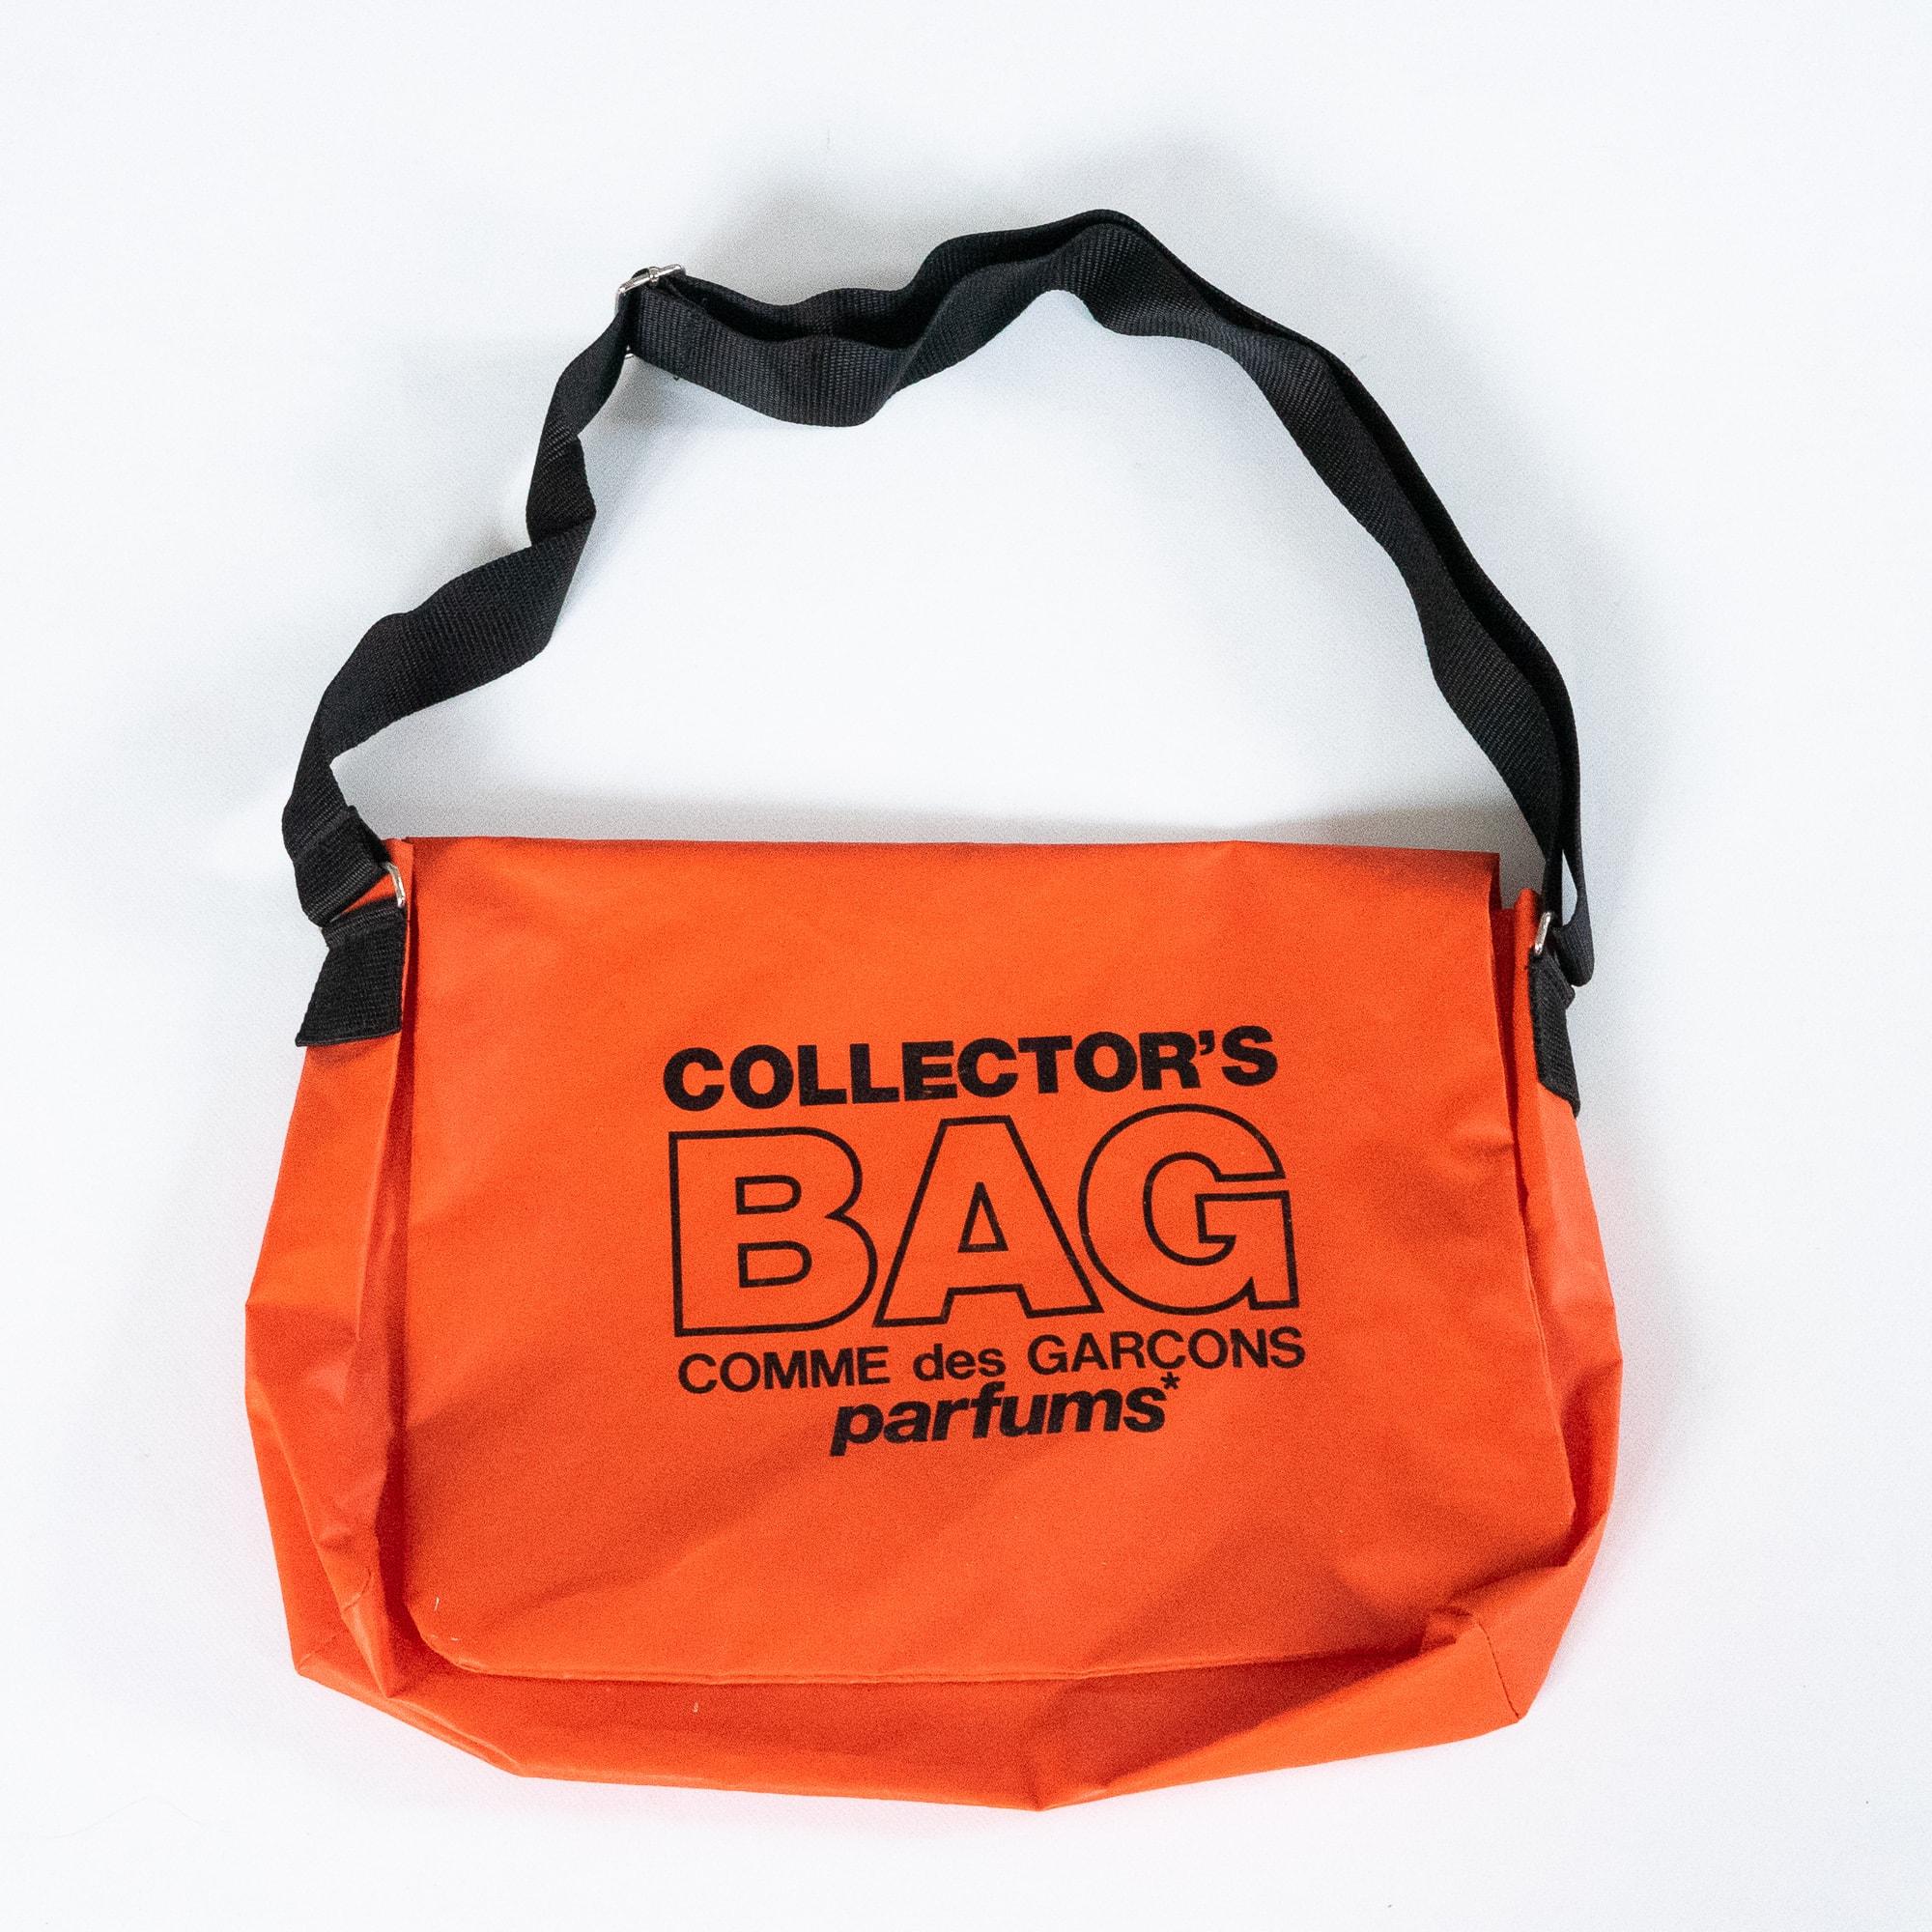 gebraucht kaufen Comme des Garçons Parfums Collectors Bag